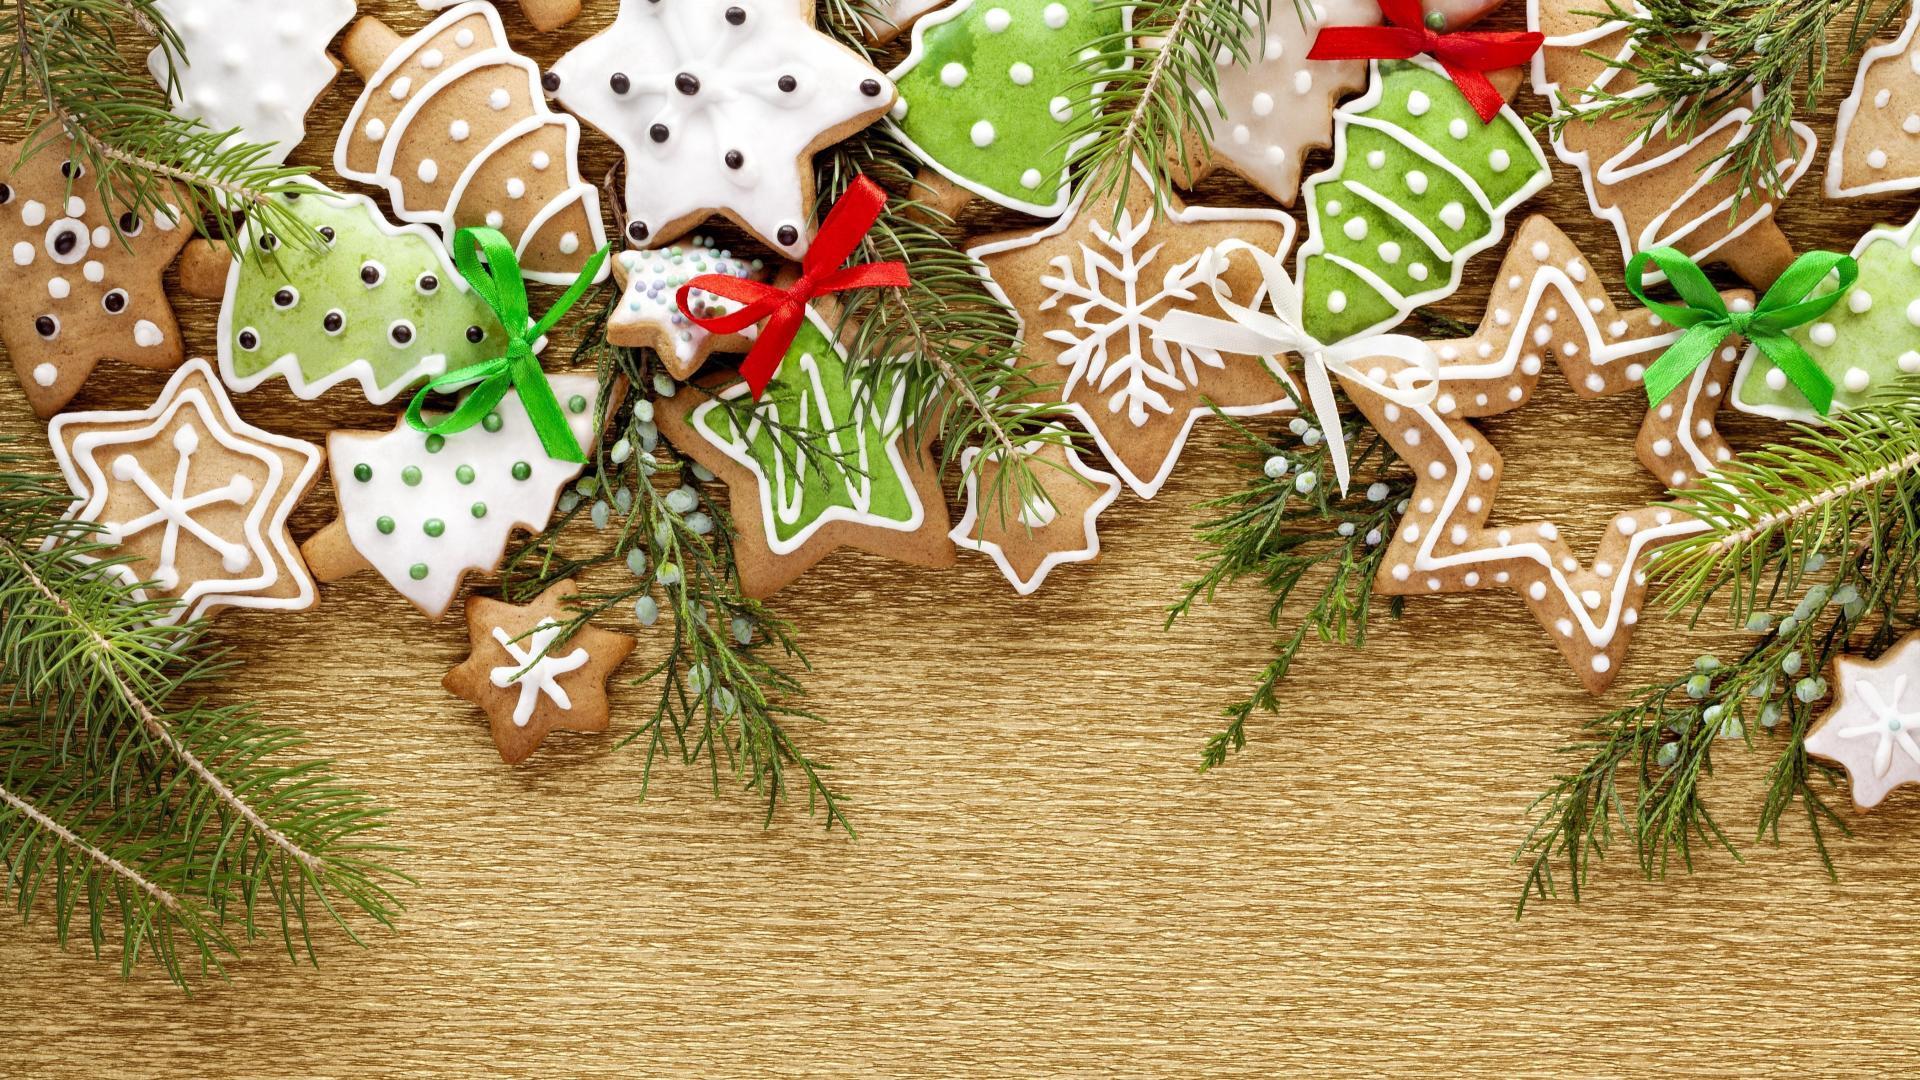 Christmas Cookies Wallpaper  Christmas Cookies wallpaper